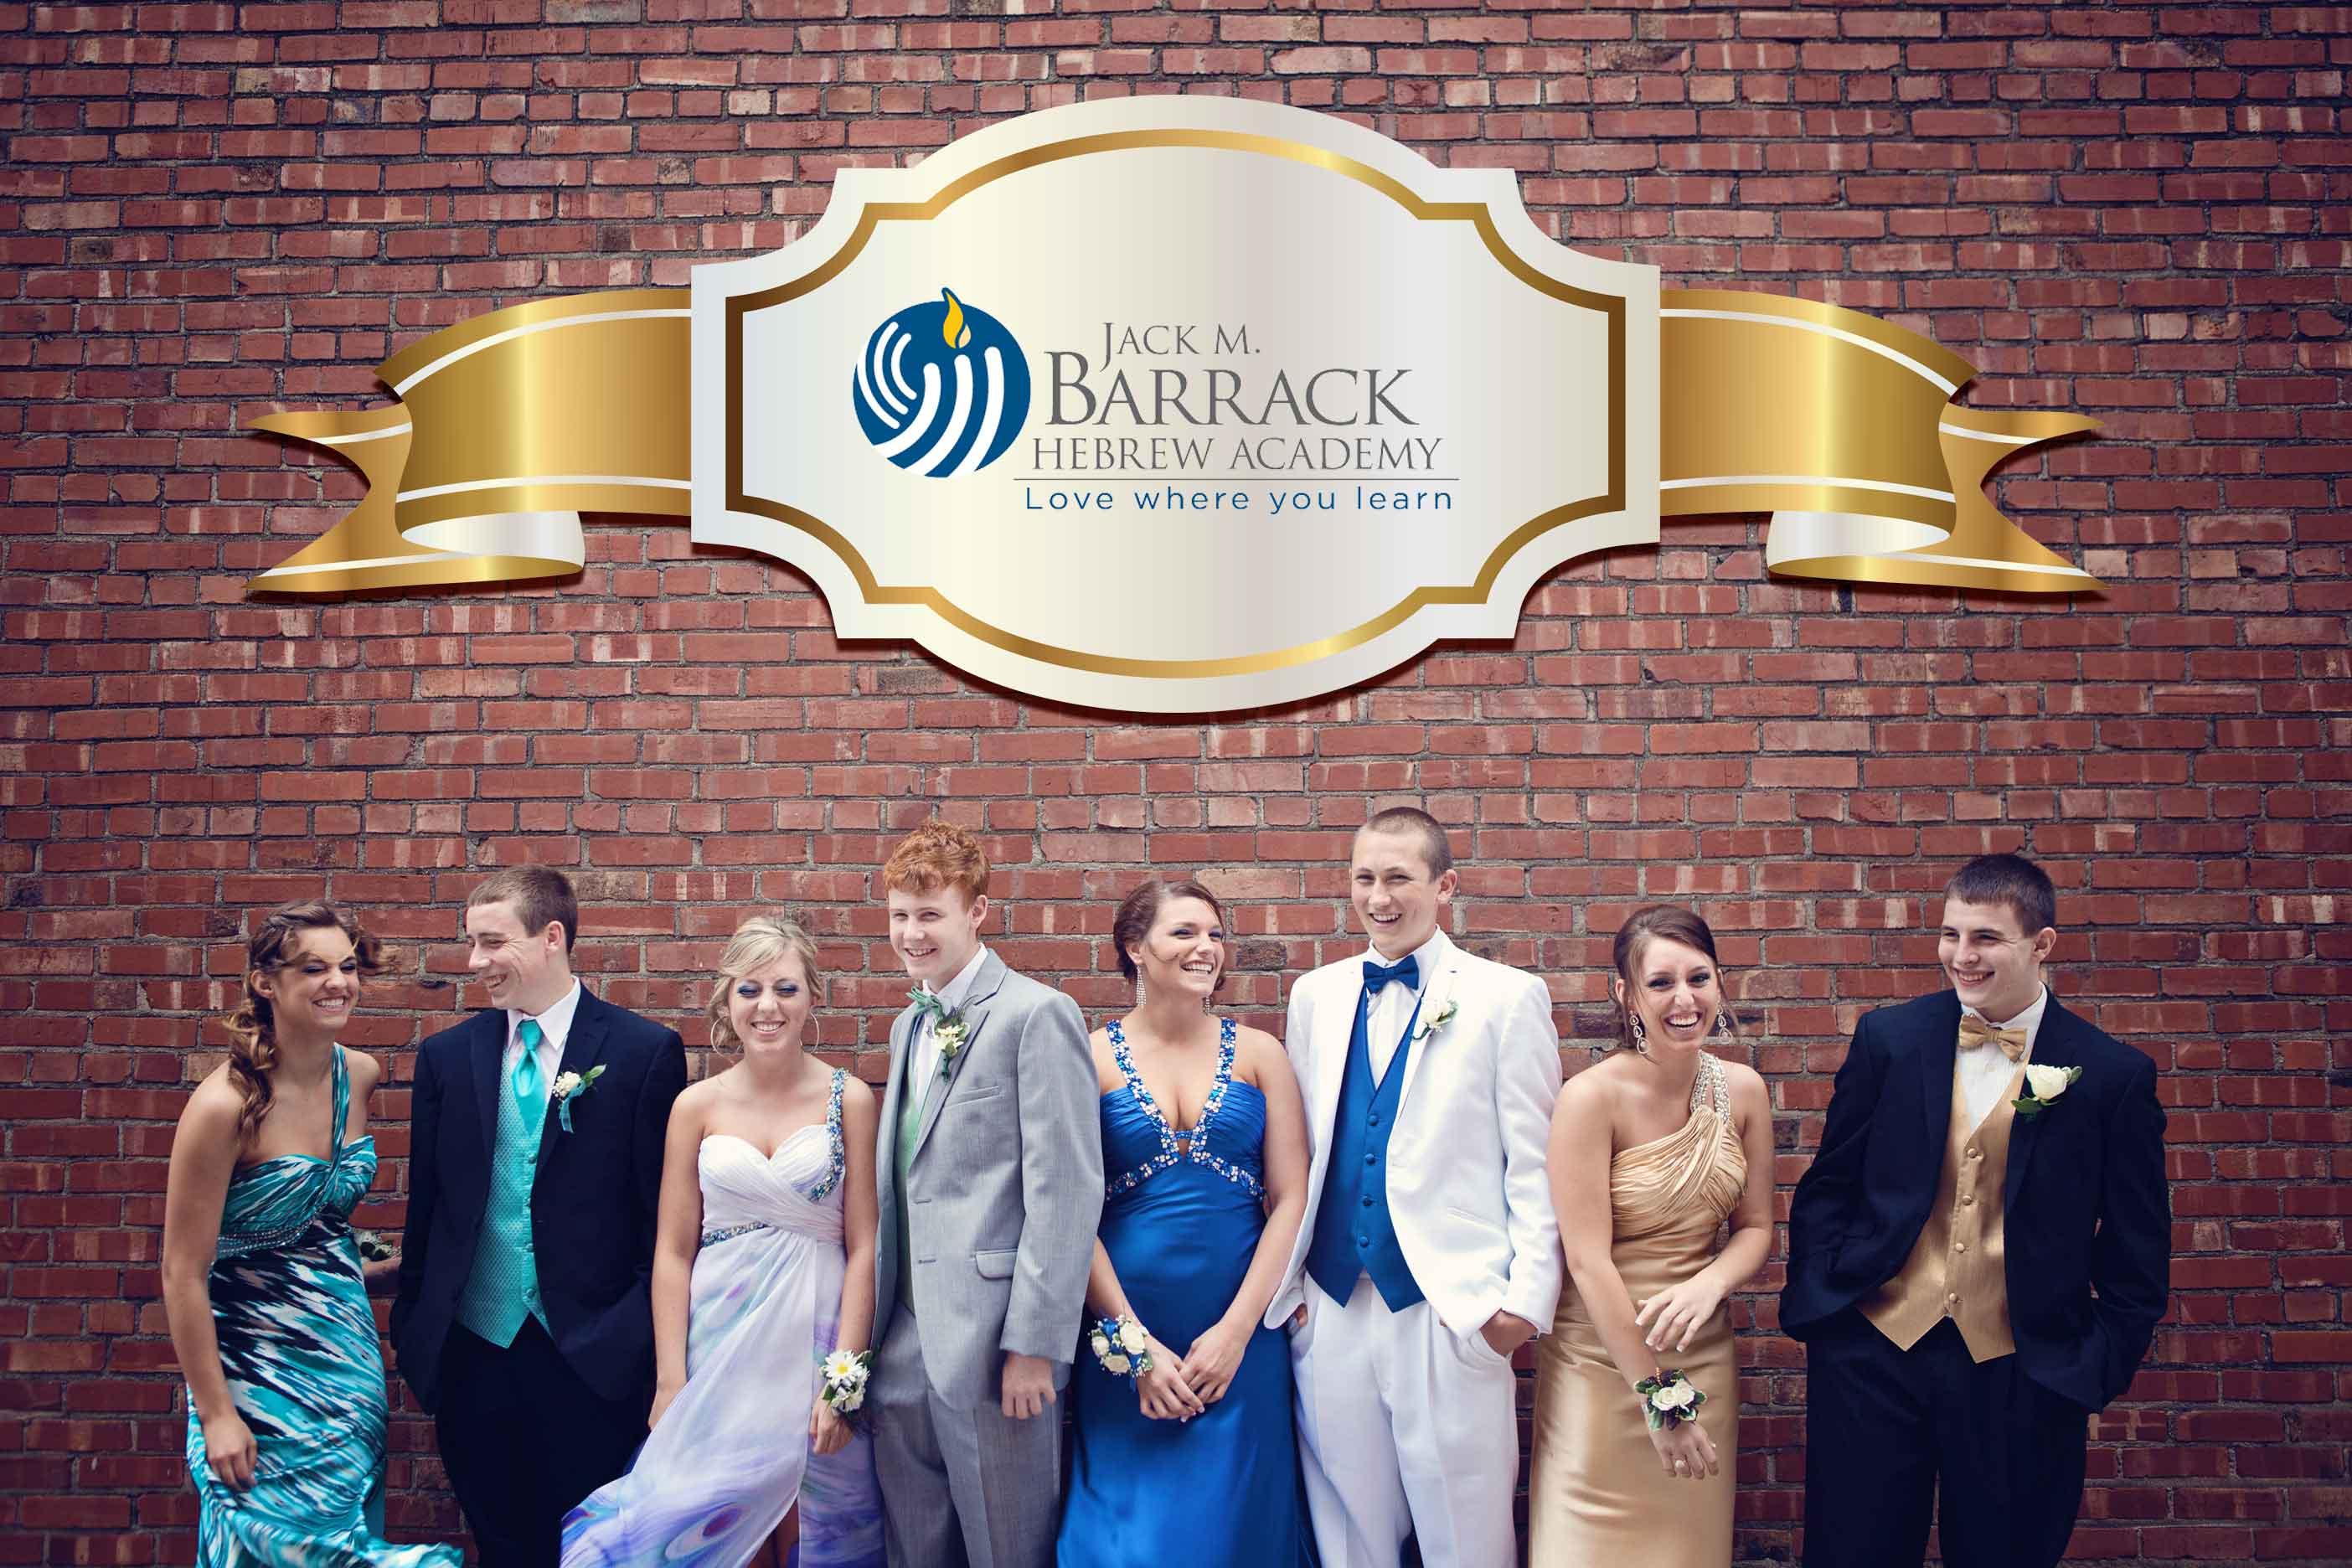 jack barrack hebrew academy prom